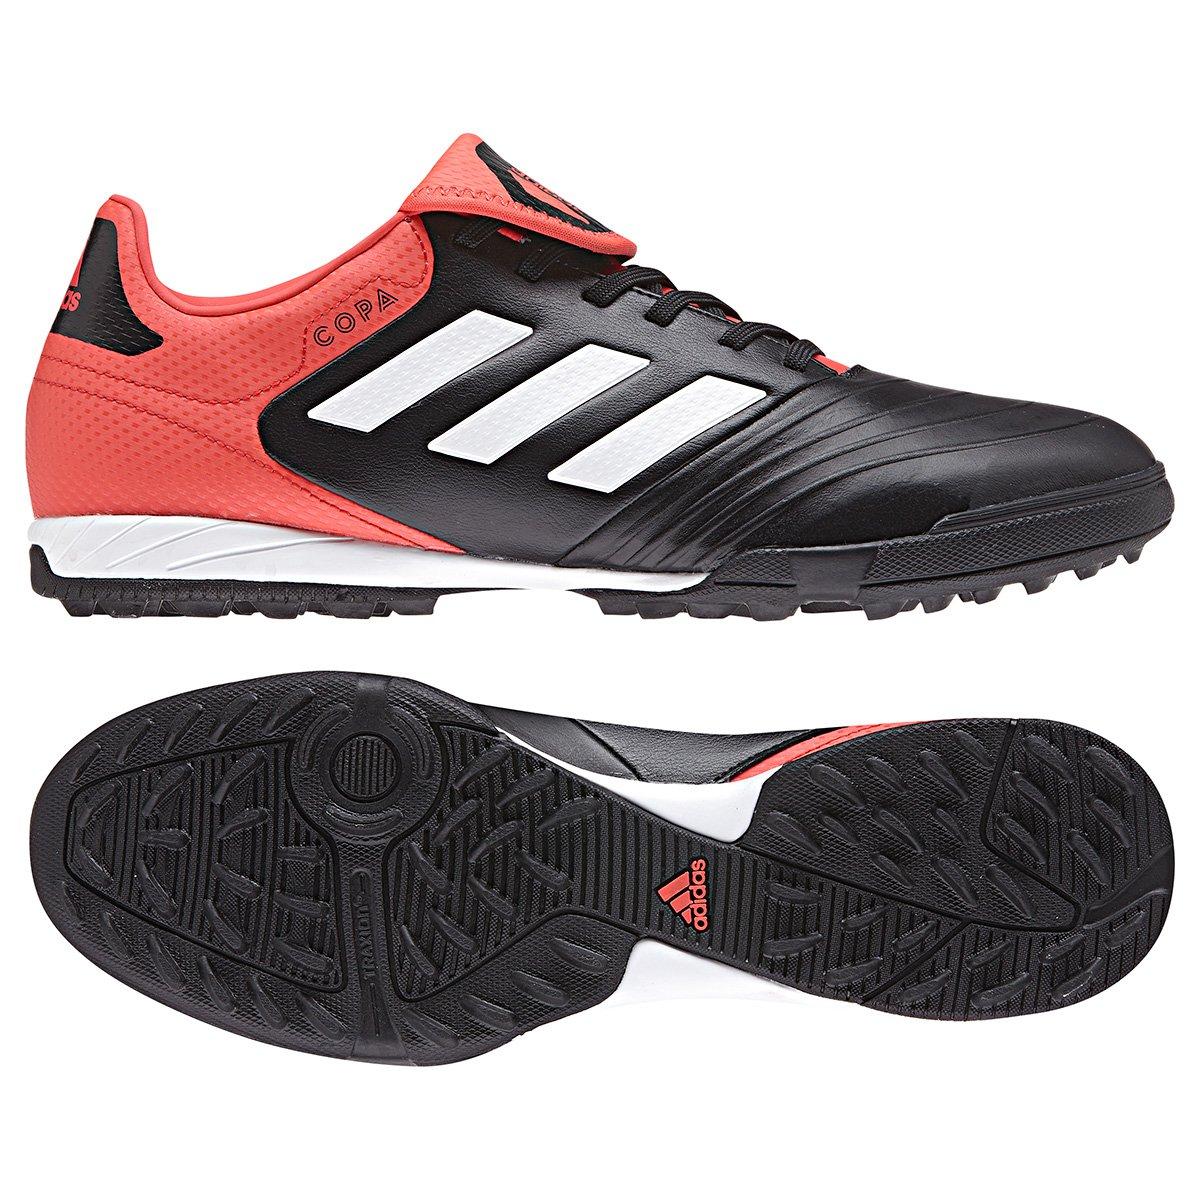 0c29855317 Shopping Smiles - Chuteira Society Adidas Copa 18.3 TF